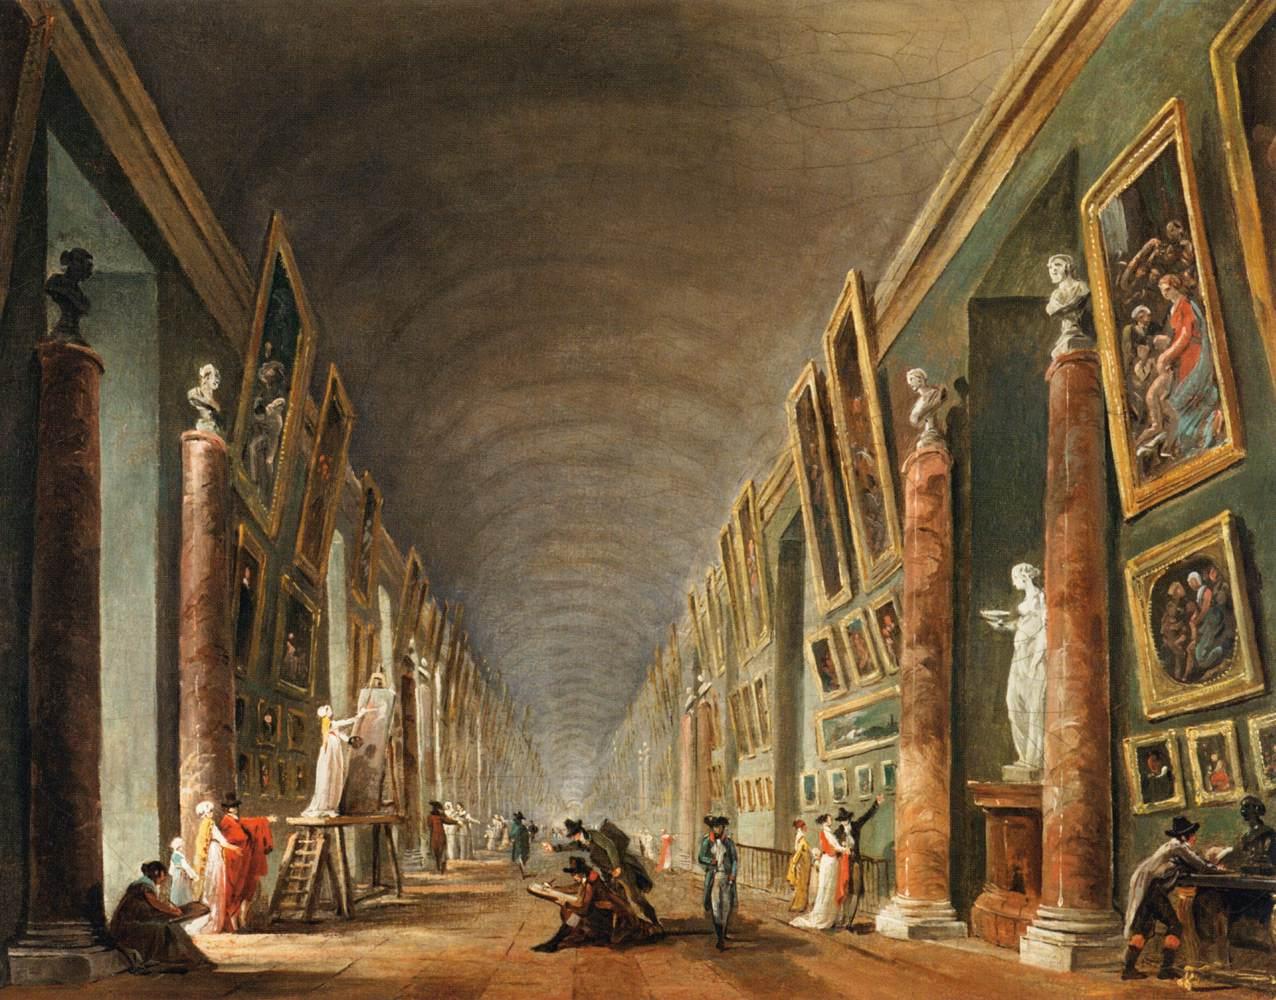 The Grande Galerie, 1795